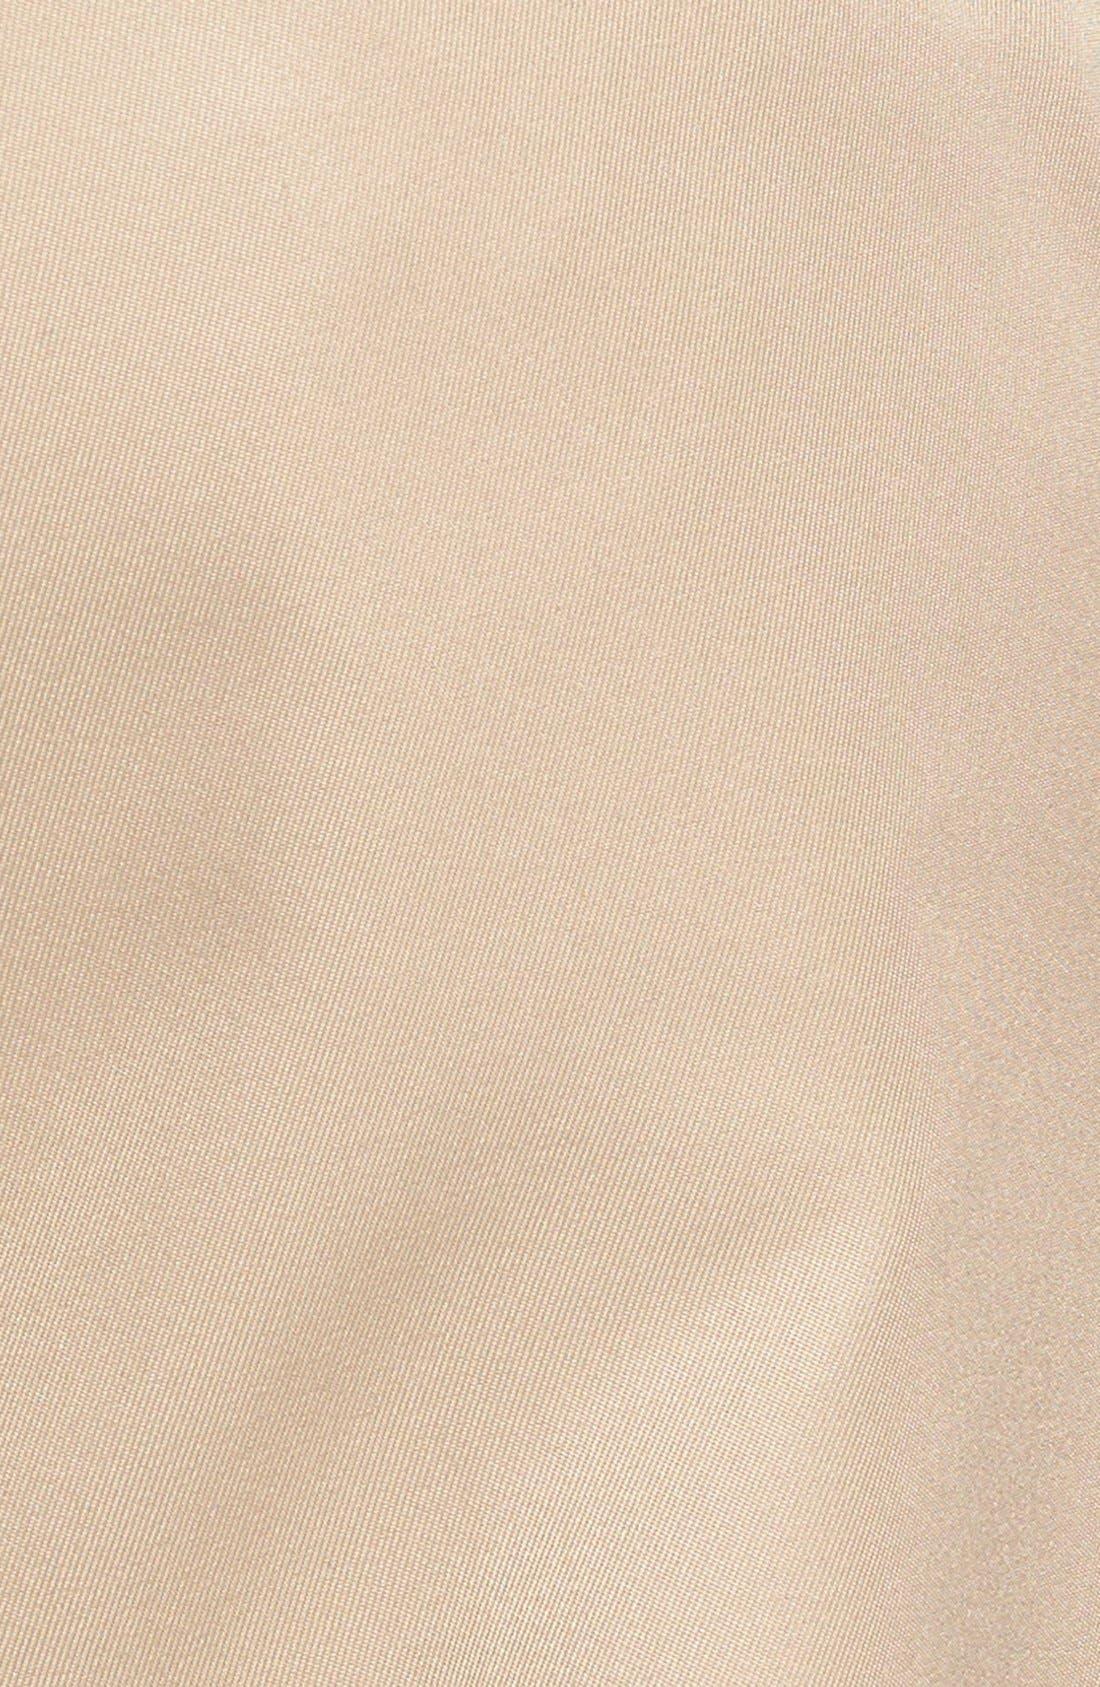 Self Sizer Waist Flat Front Trousers,                             Alternate thumbnail 2, color,                             Tan